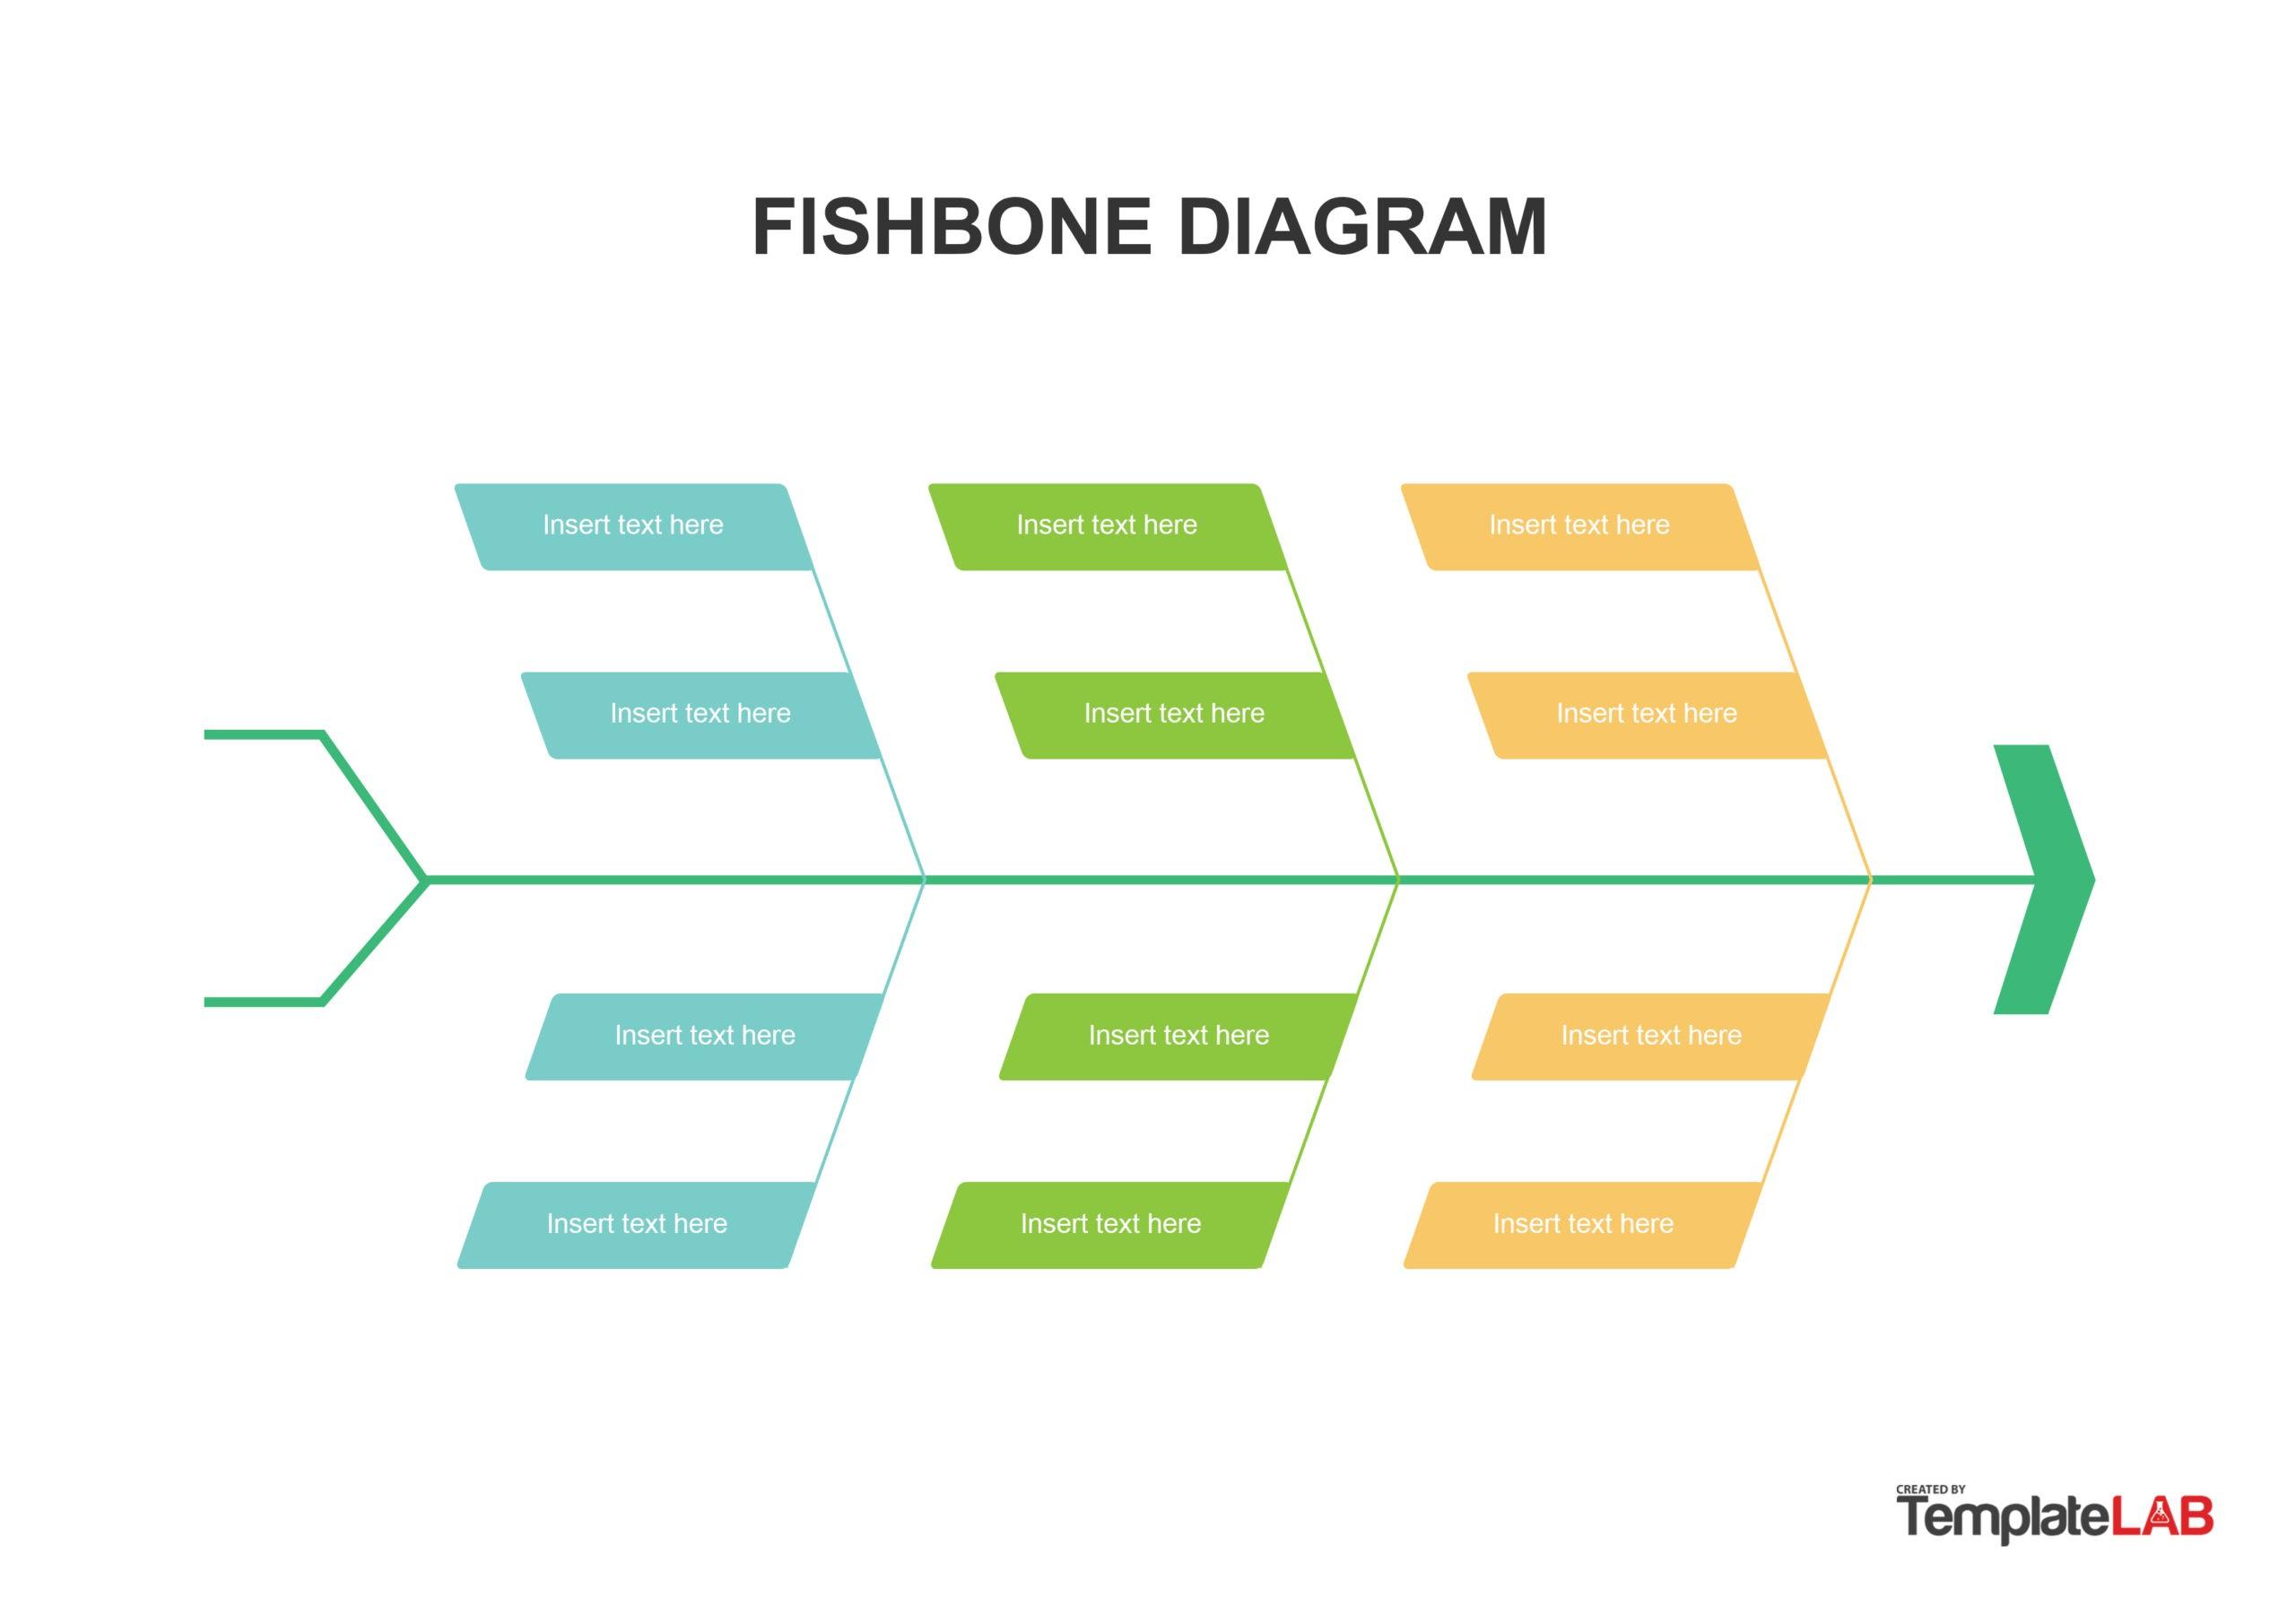 Free Fishbone Diagram Template 06 - TemplateLab.com